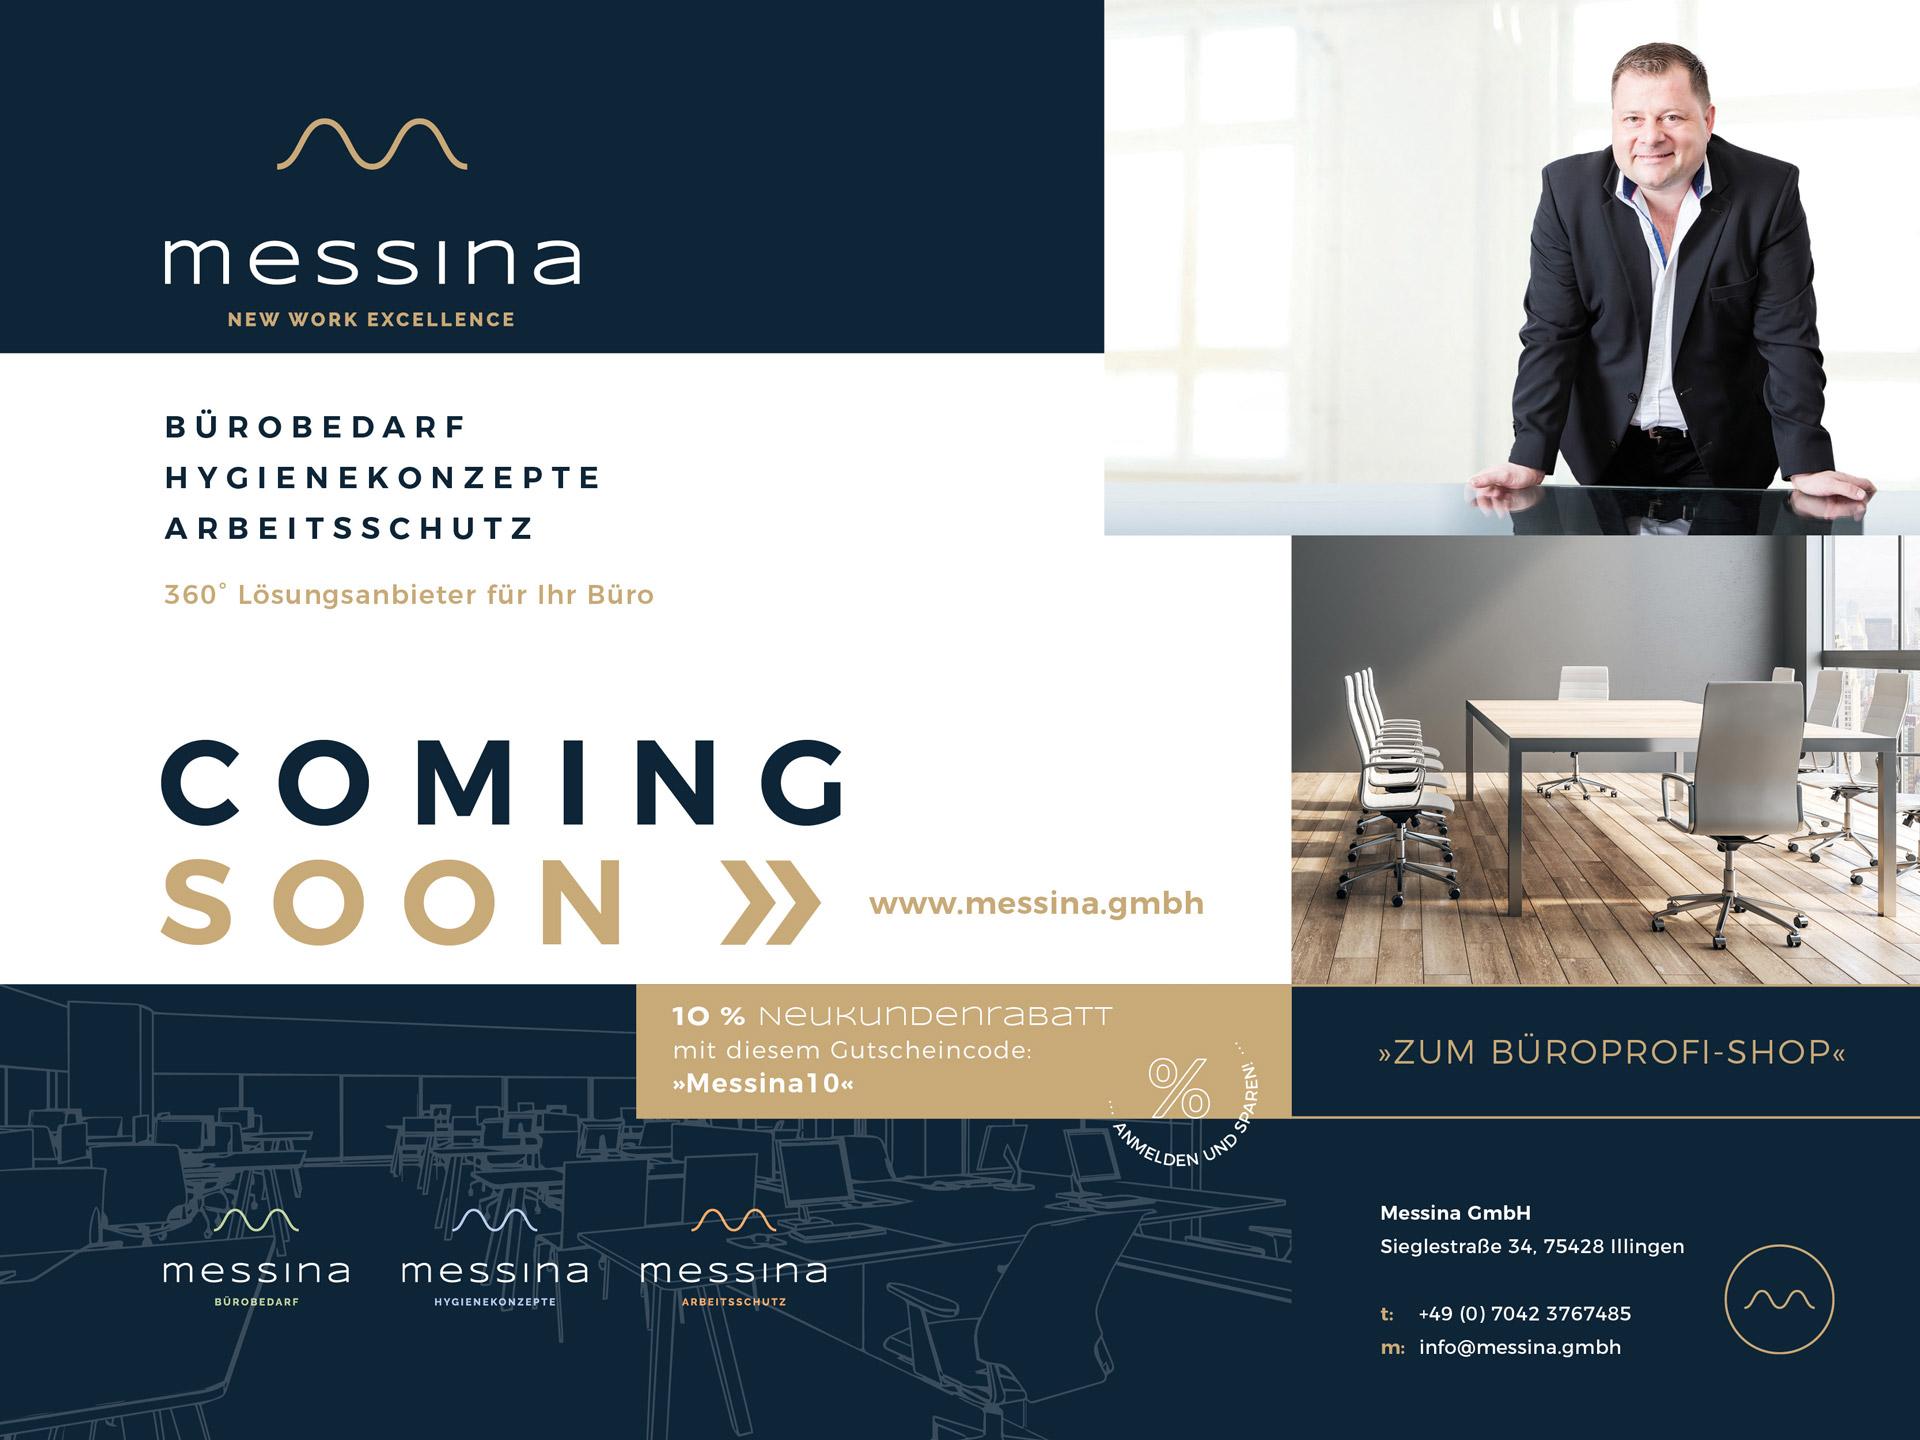 Messina GmbH